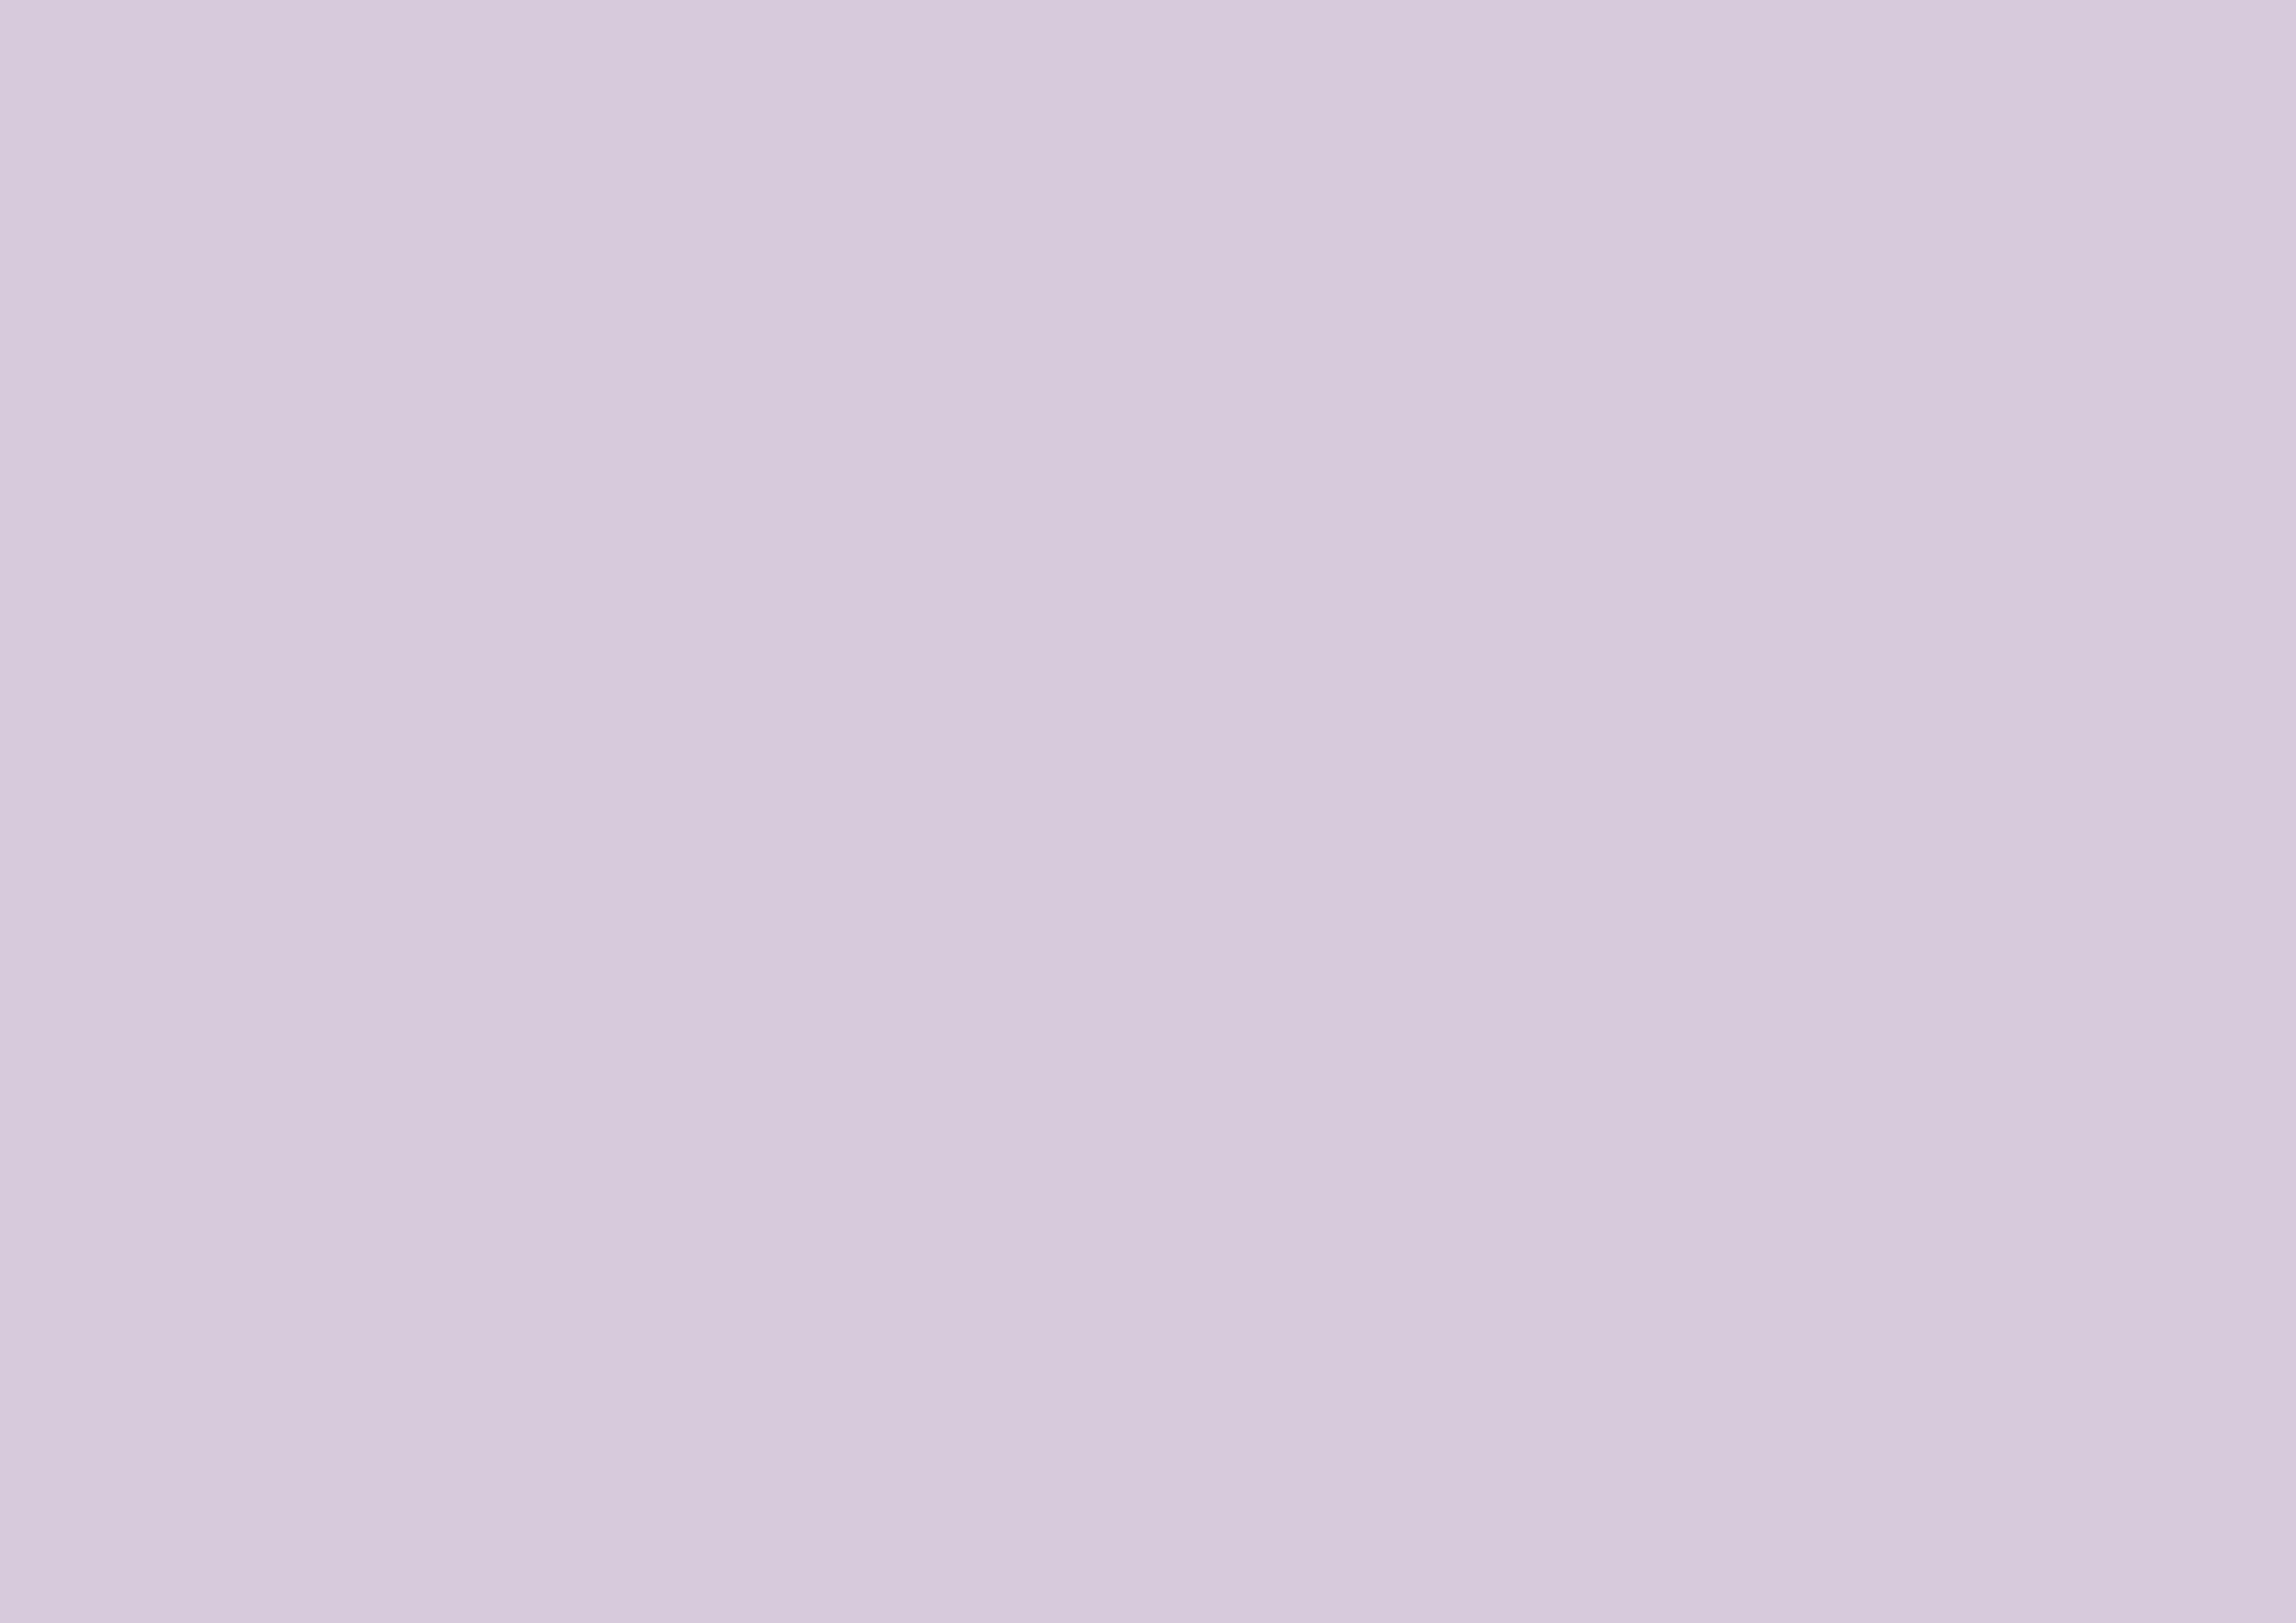 3508x2480 Languid Lavender Solid Color Background